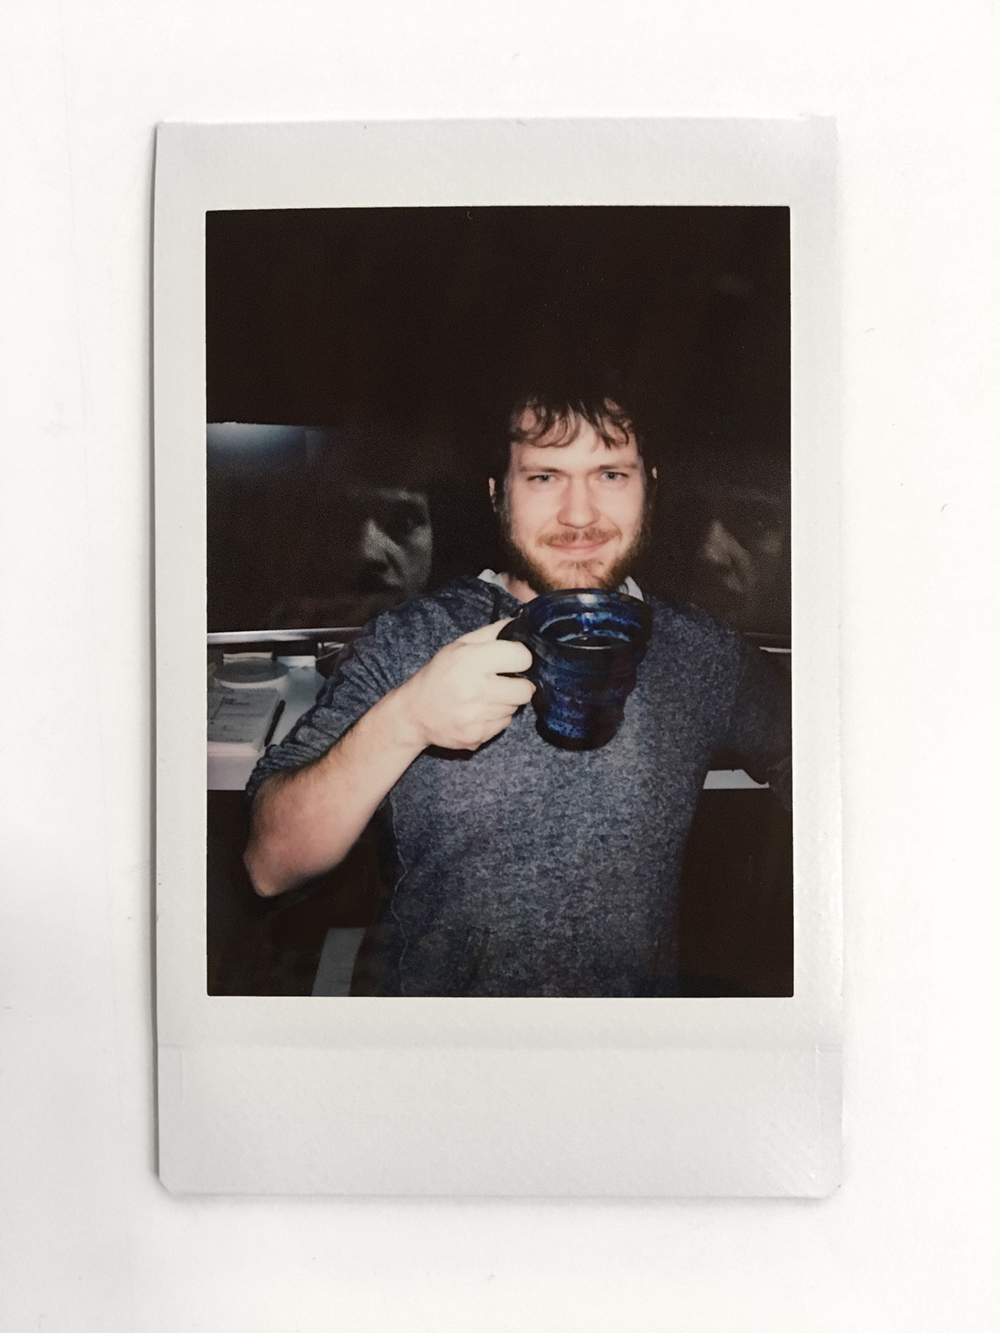 <b>Eric Bacus</b><br /><i>Director of VFX</i>